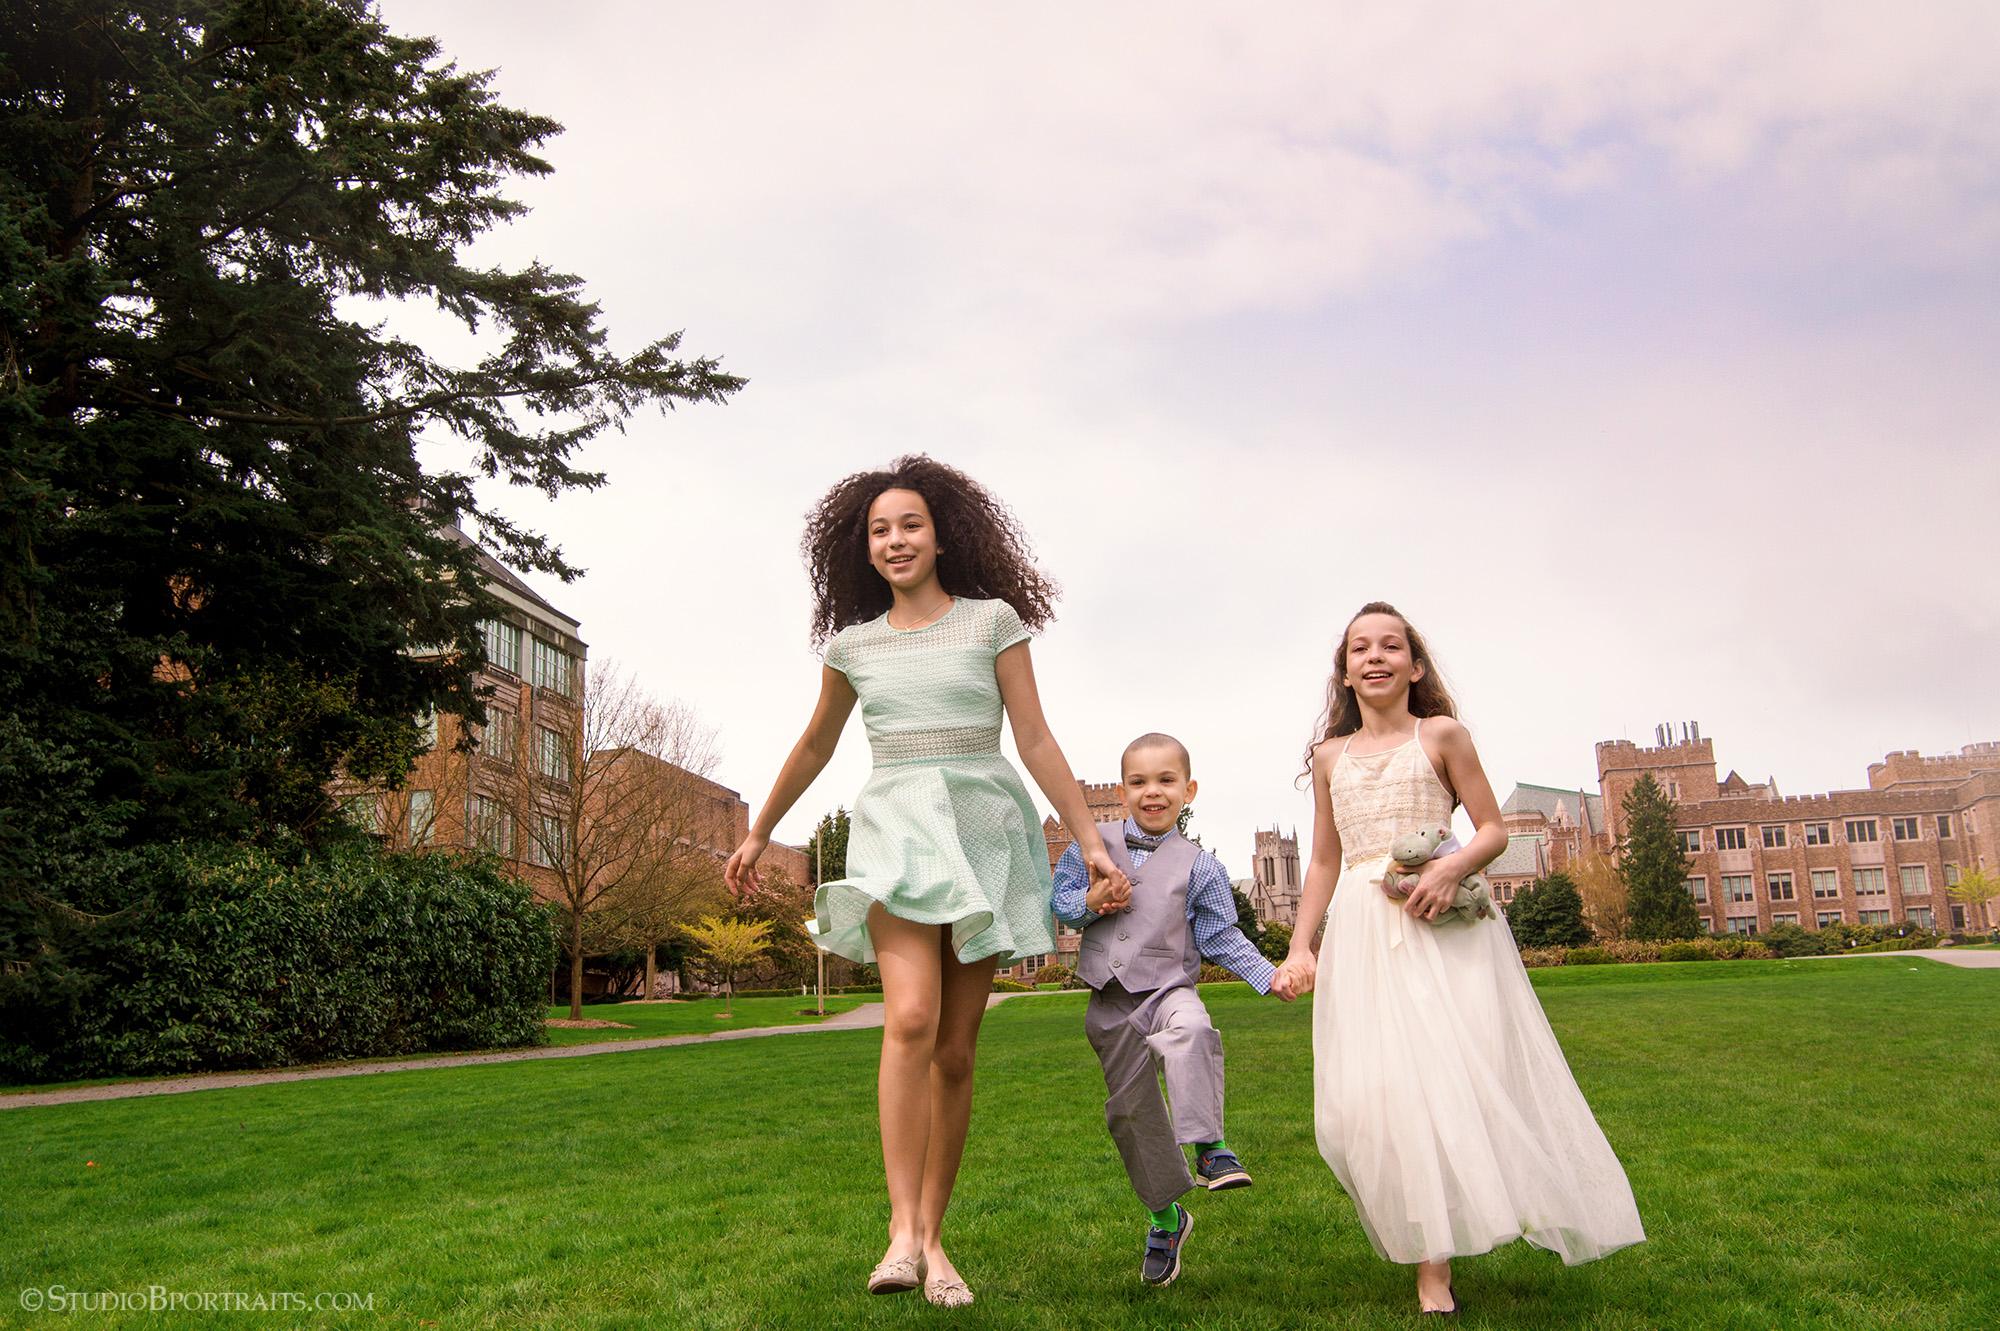 Children skipping in formal outfits at University of Washington_Studio B Portraits.jpg